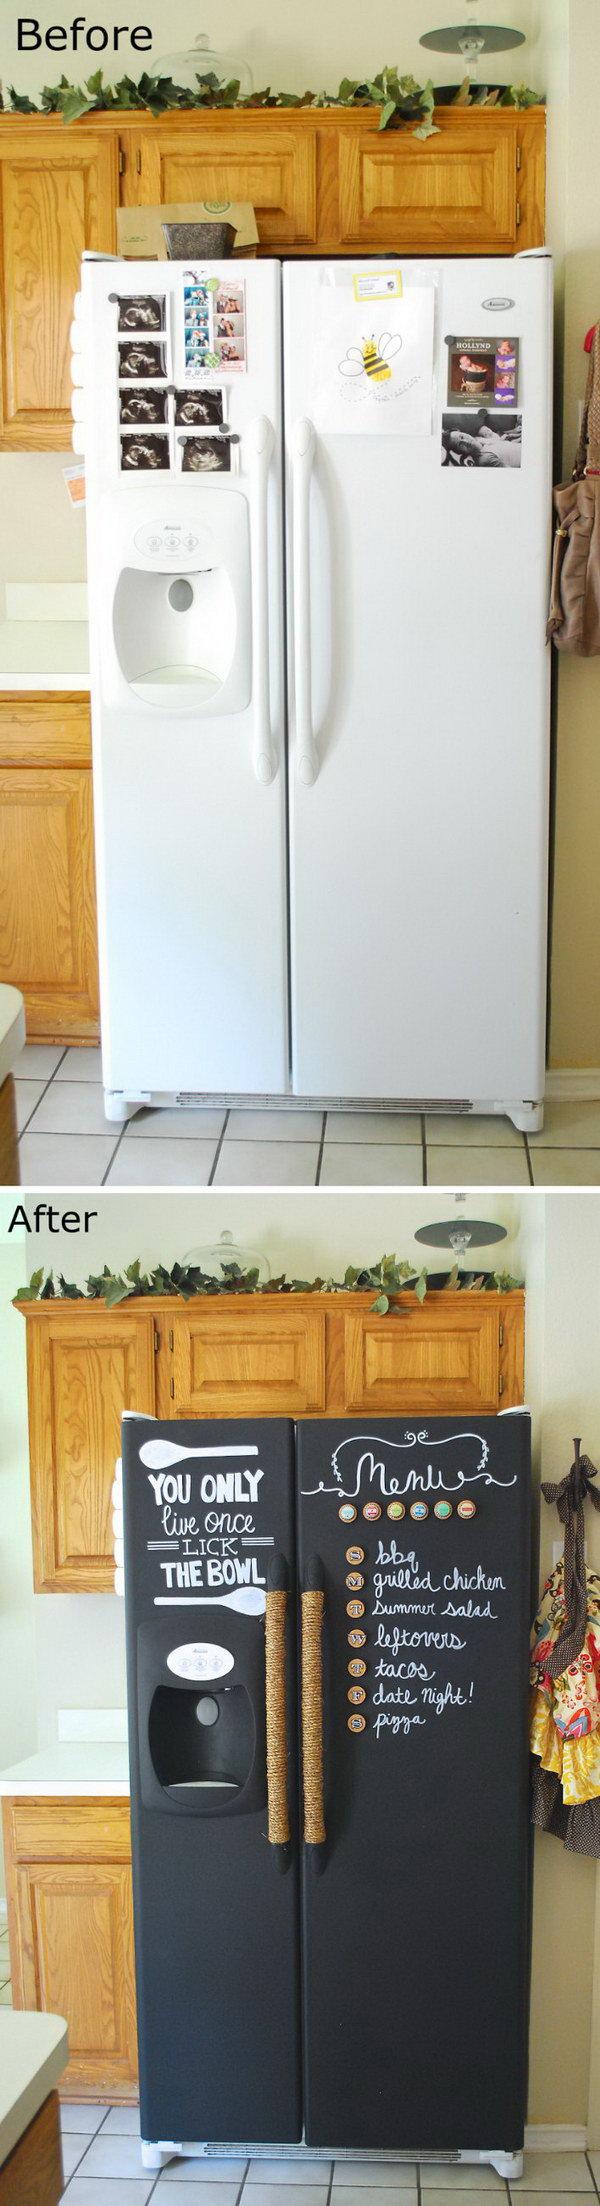 DIY Chalkboard Paint Refrigerator.